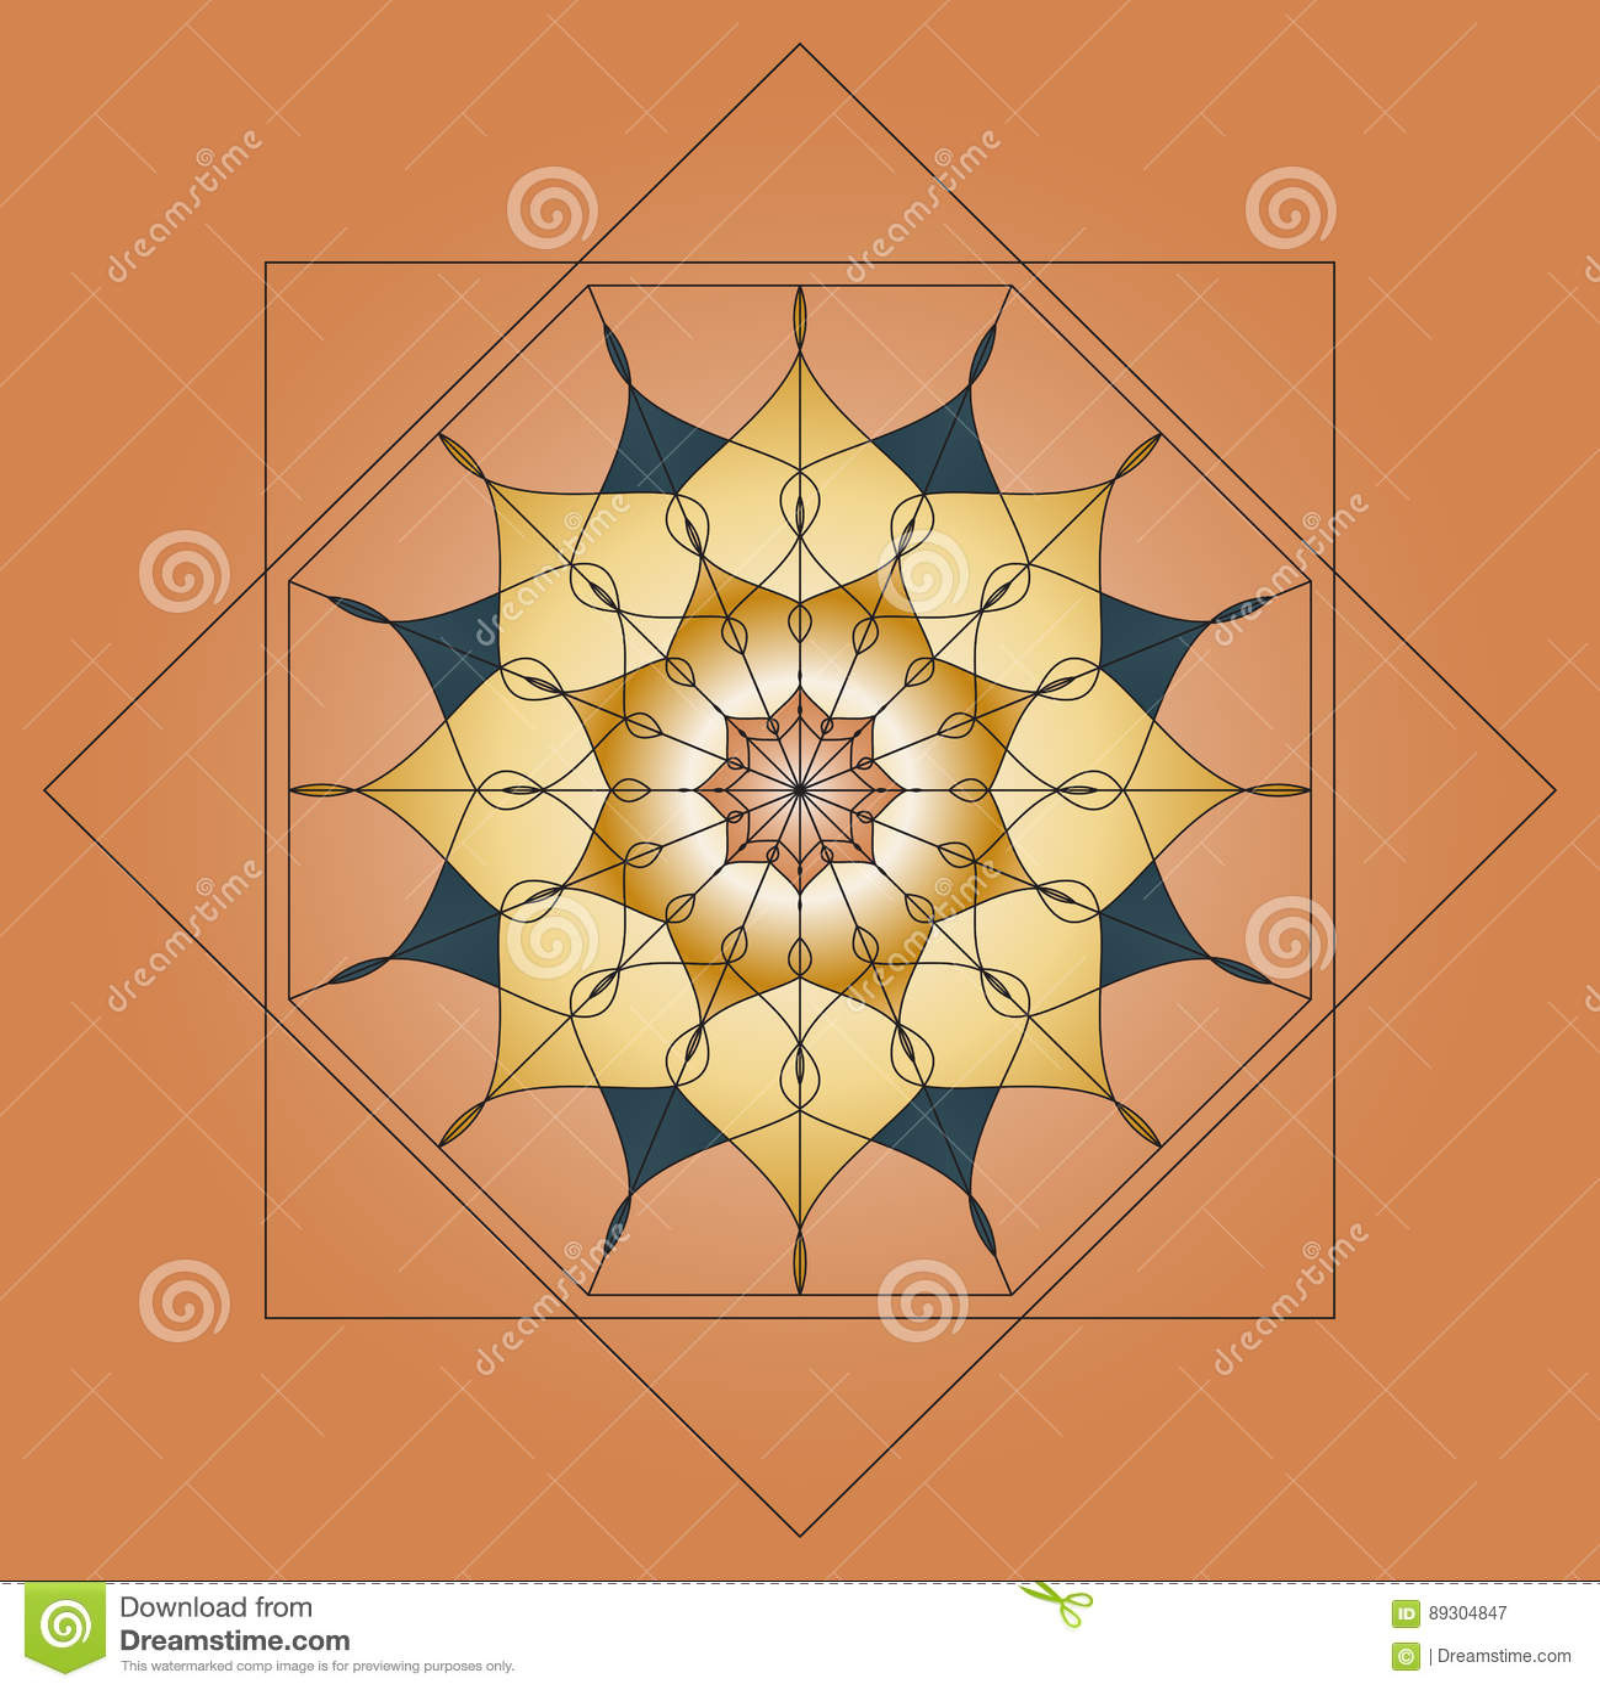 mandala round ornament element for design on beige background